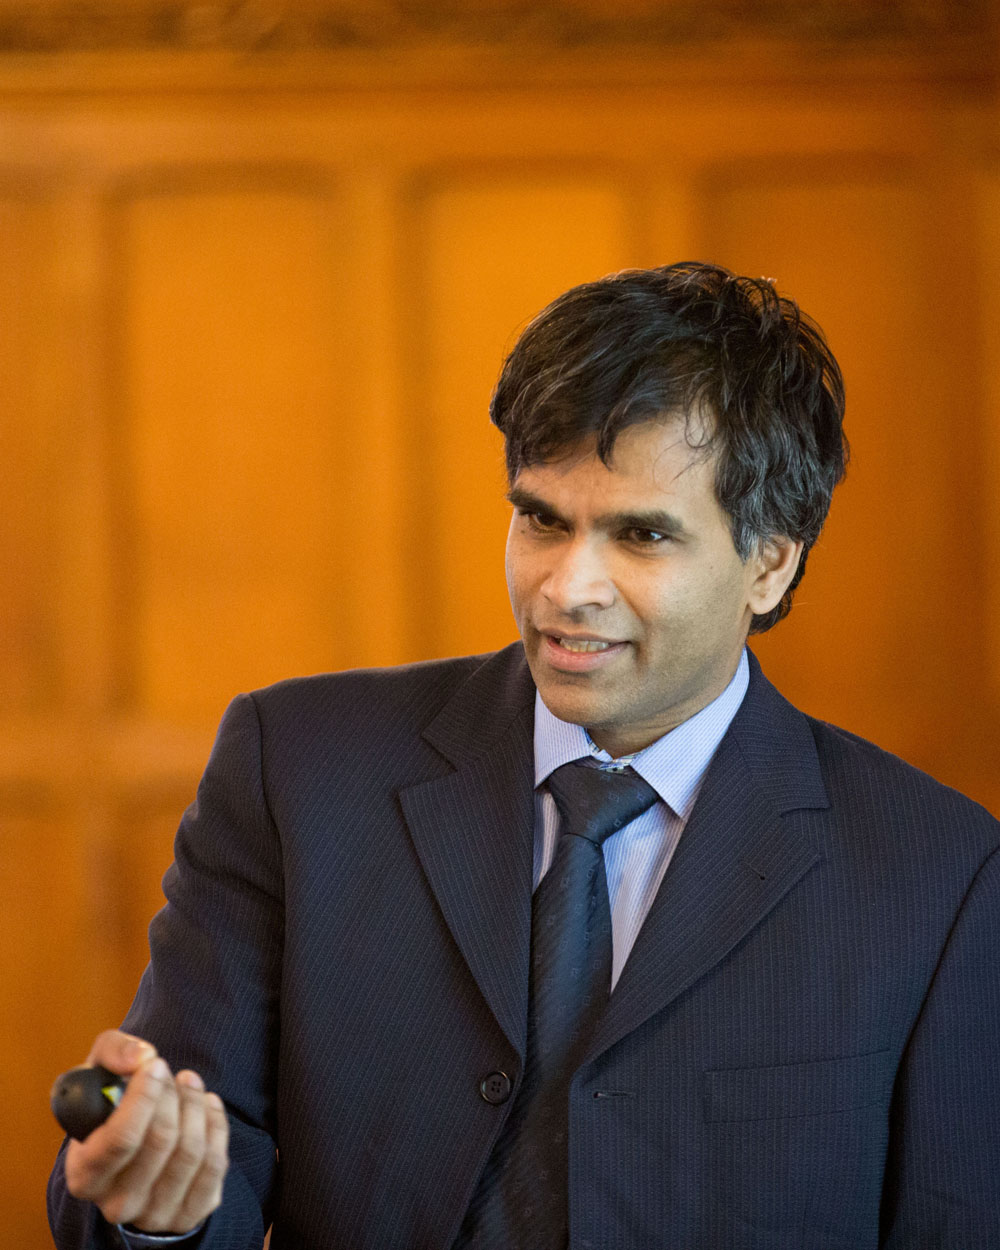 Harvard Econ. Prof. Sendhil Mullainathan